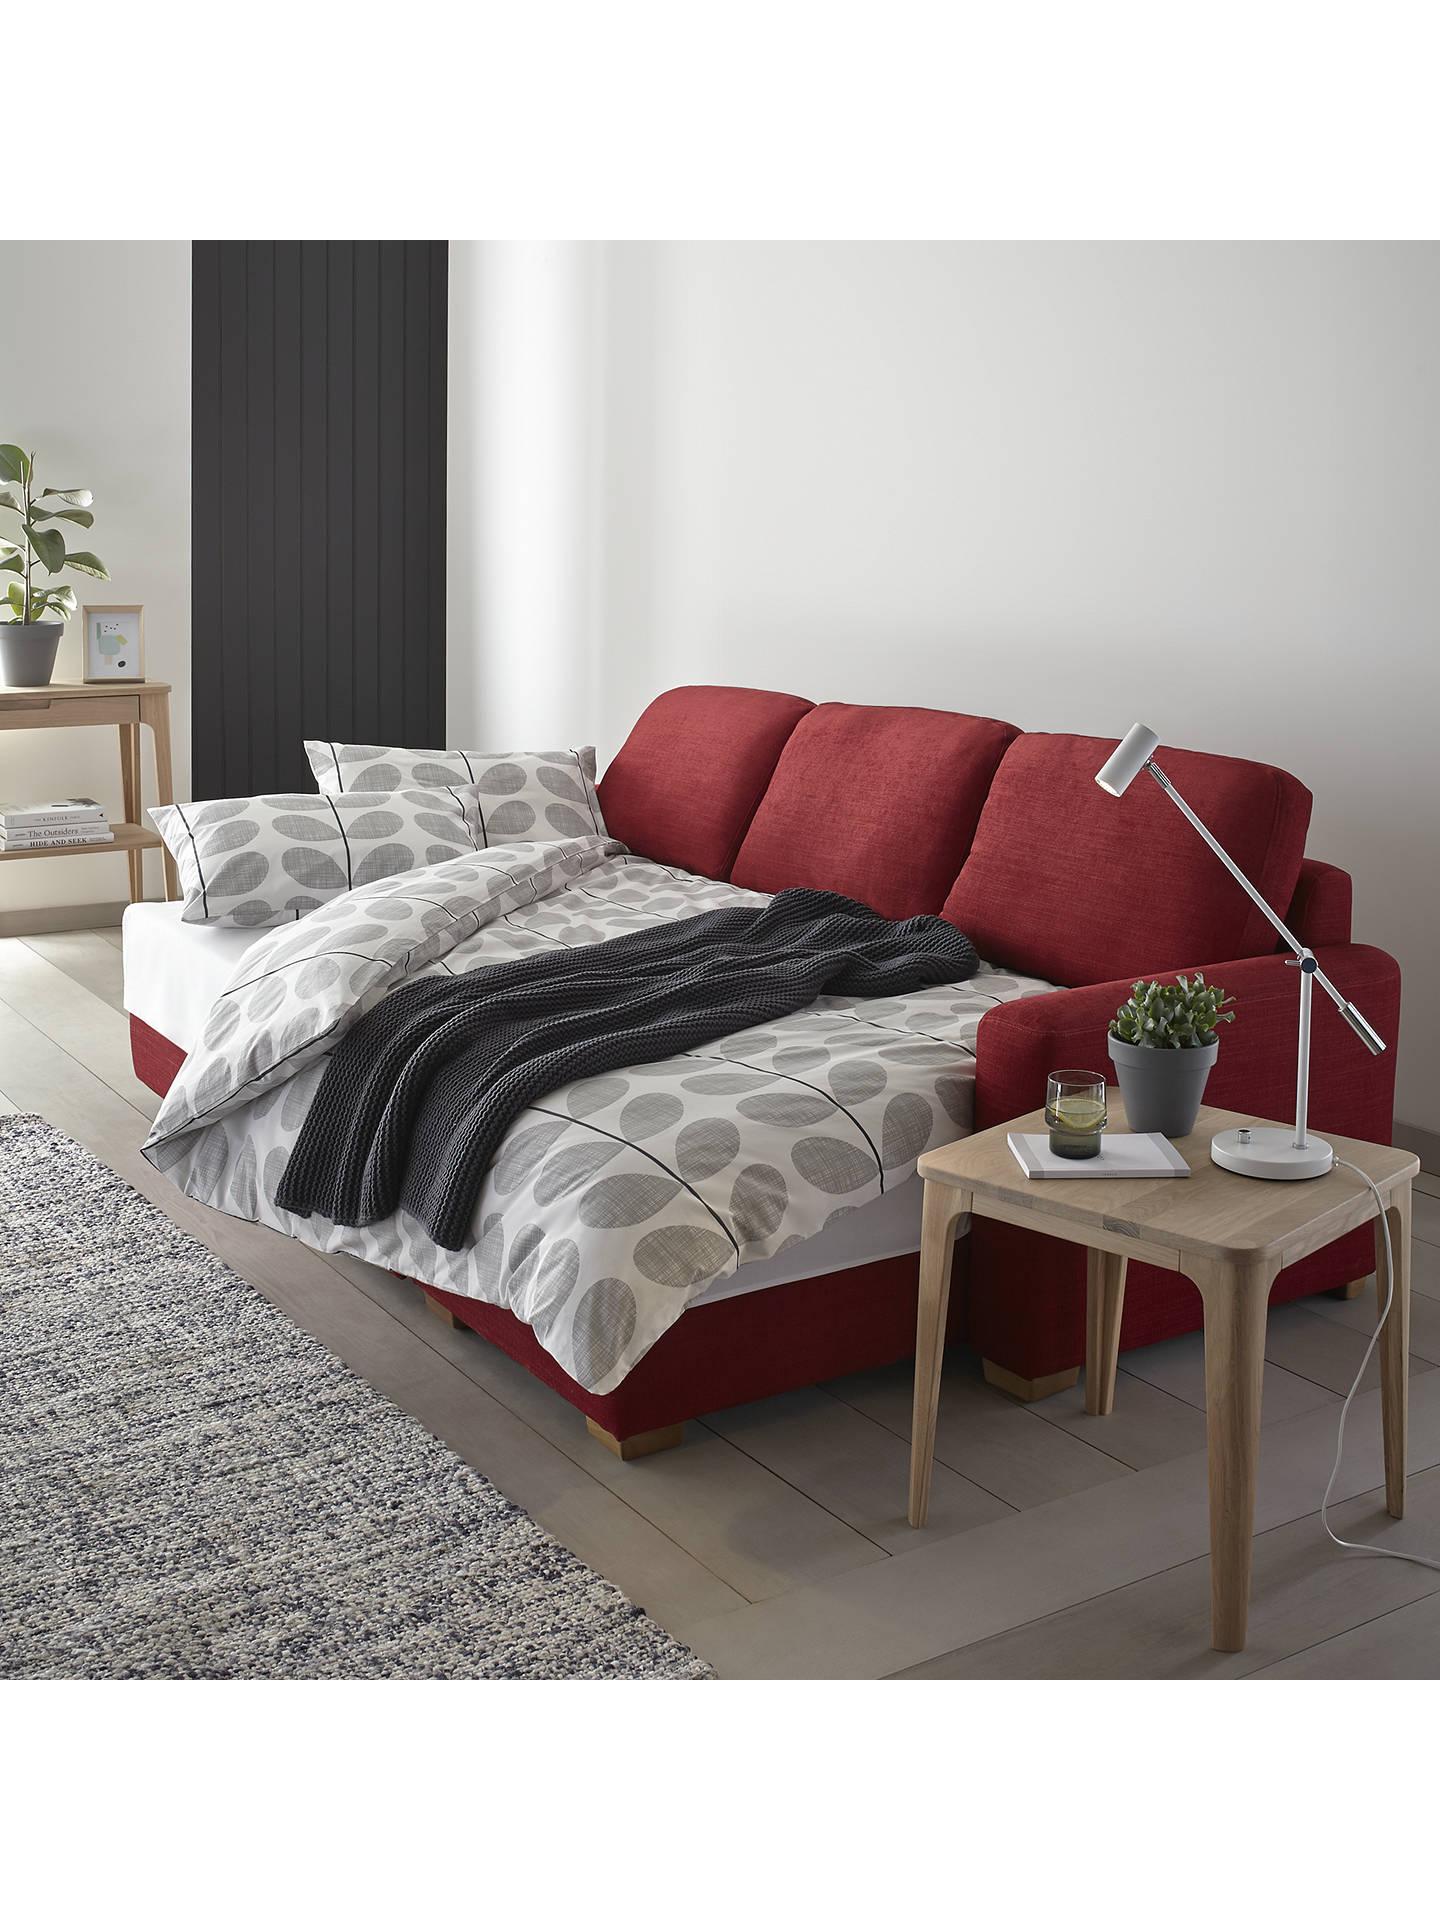 john lewis partners sacha large sofa bed with foam mattress light